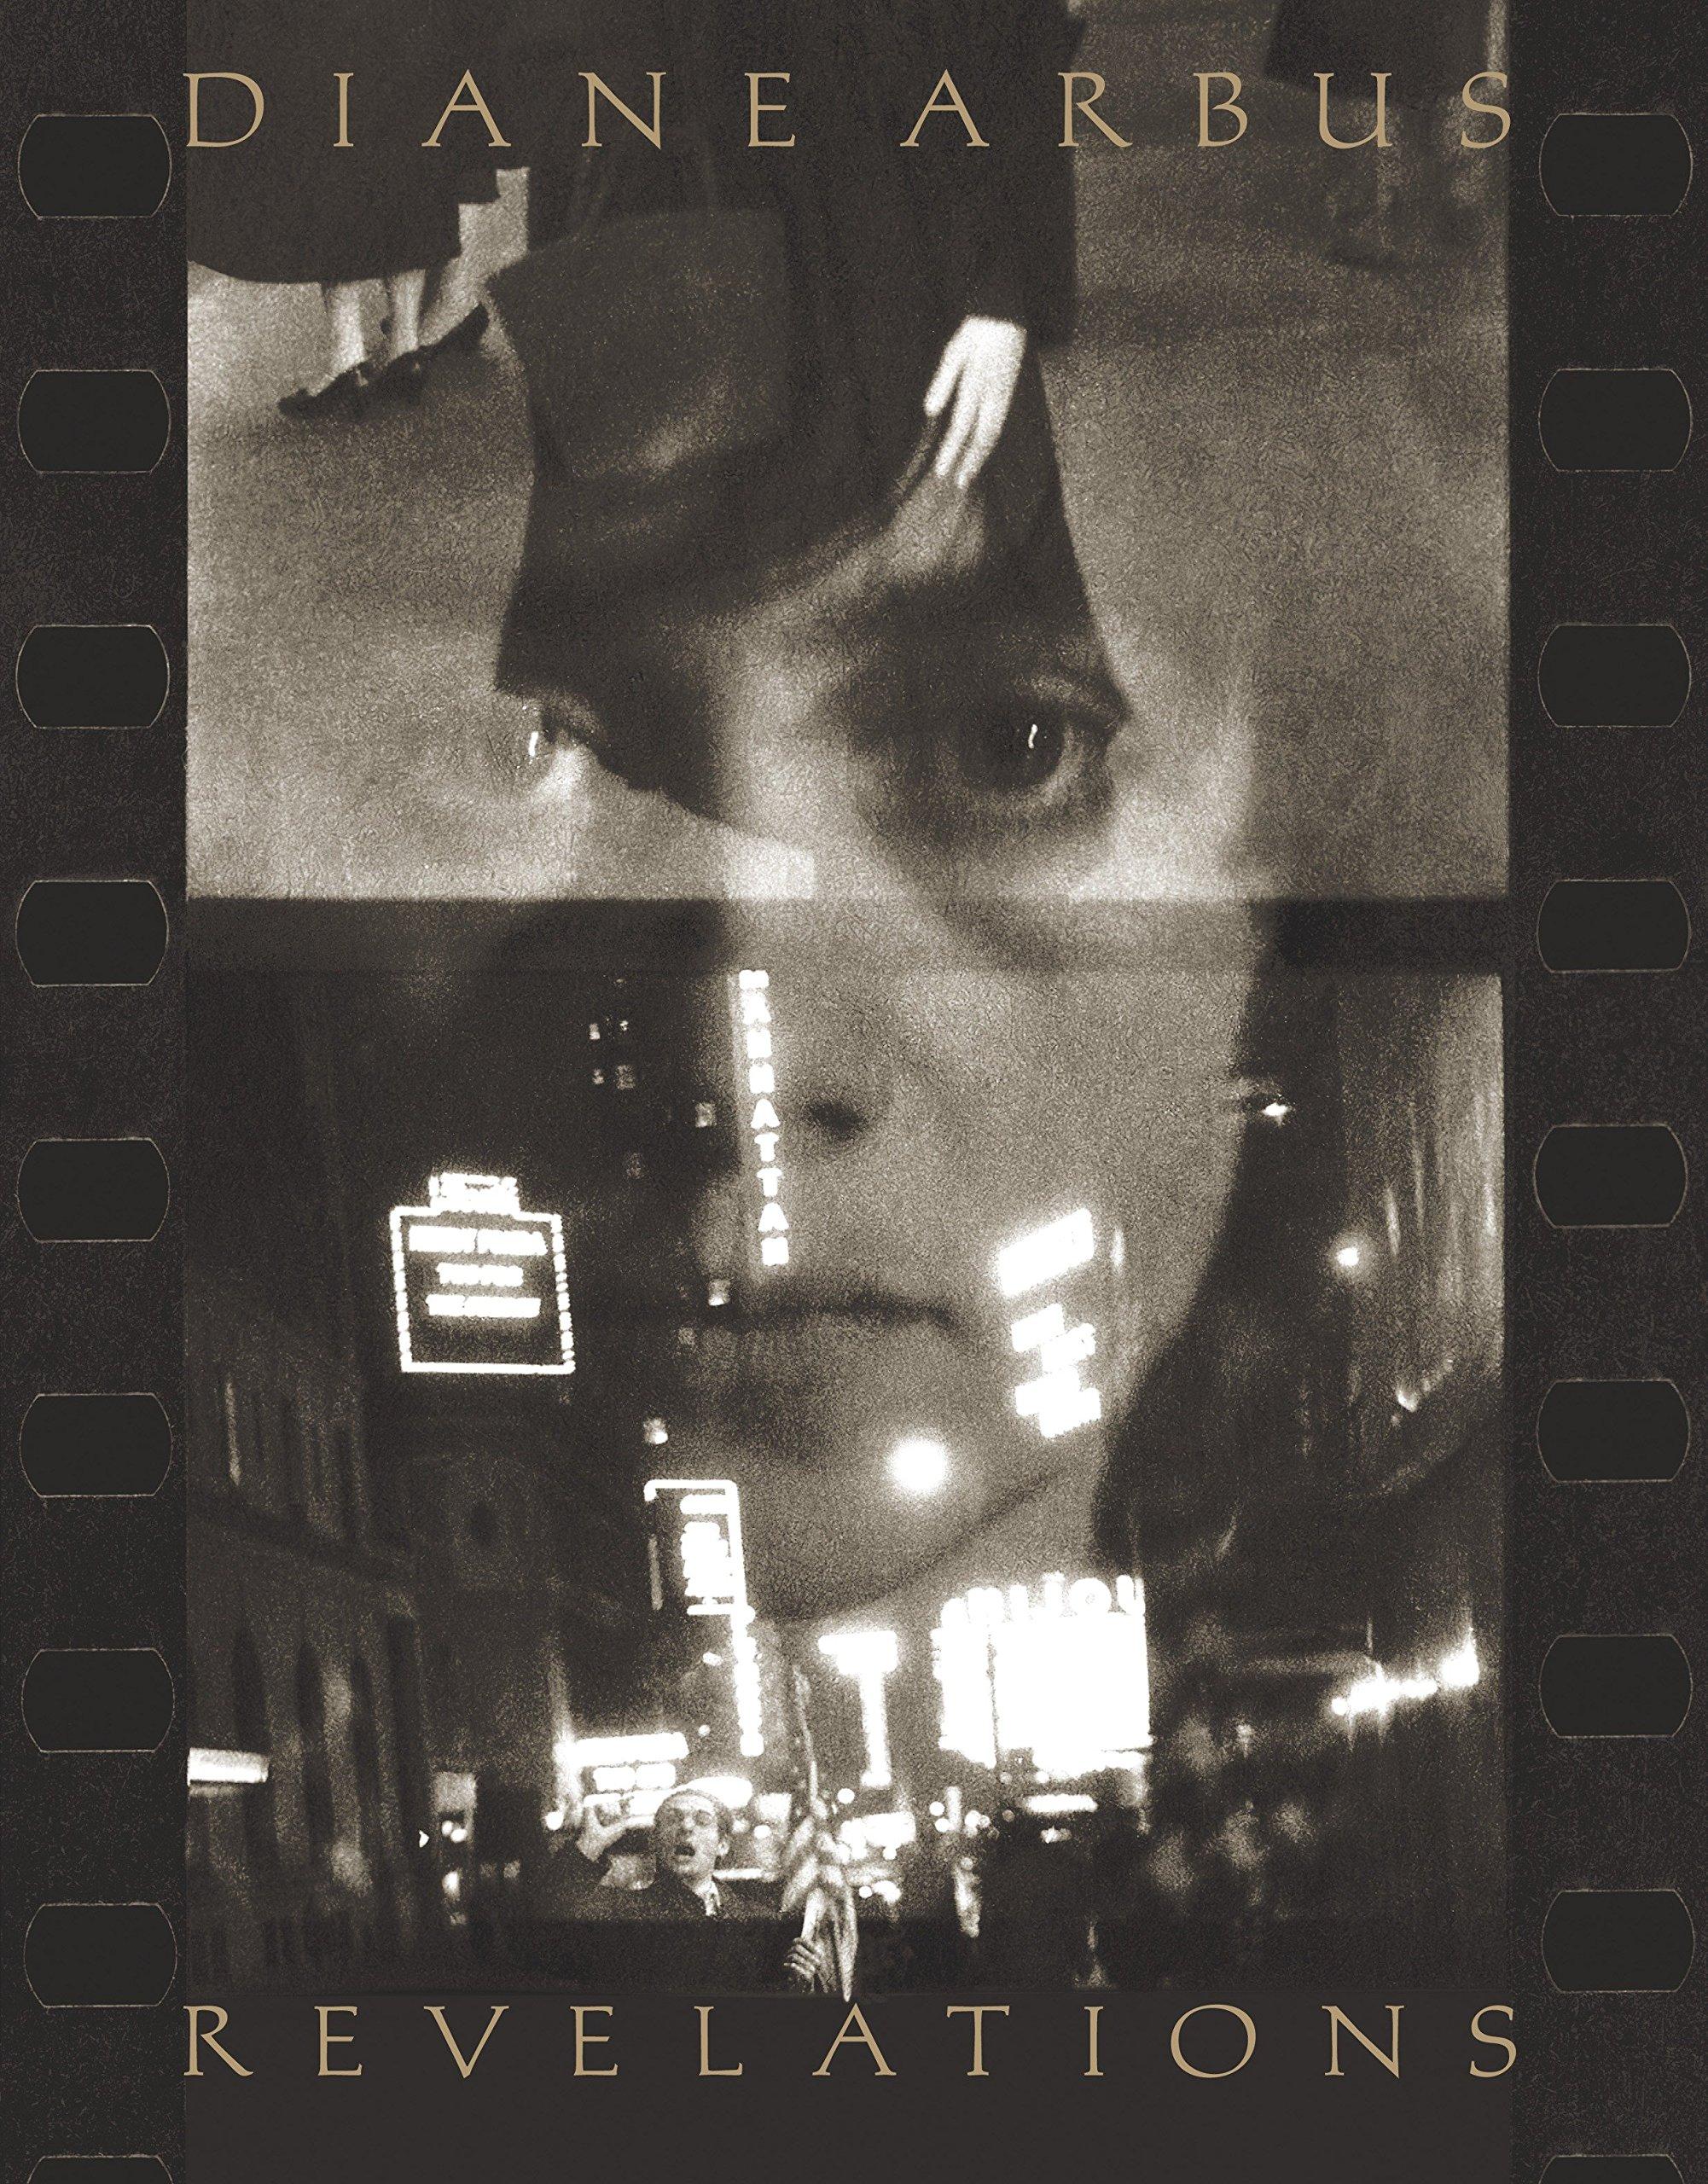 Diane Arbus - Revelations   Kym Skiles